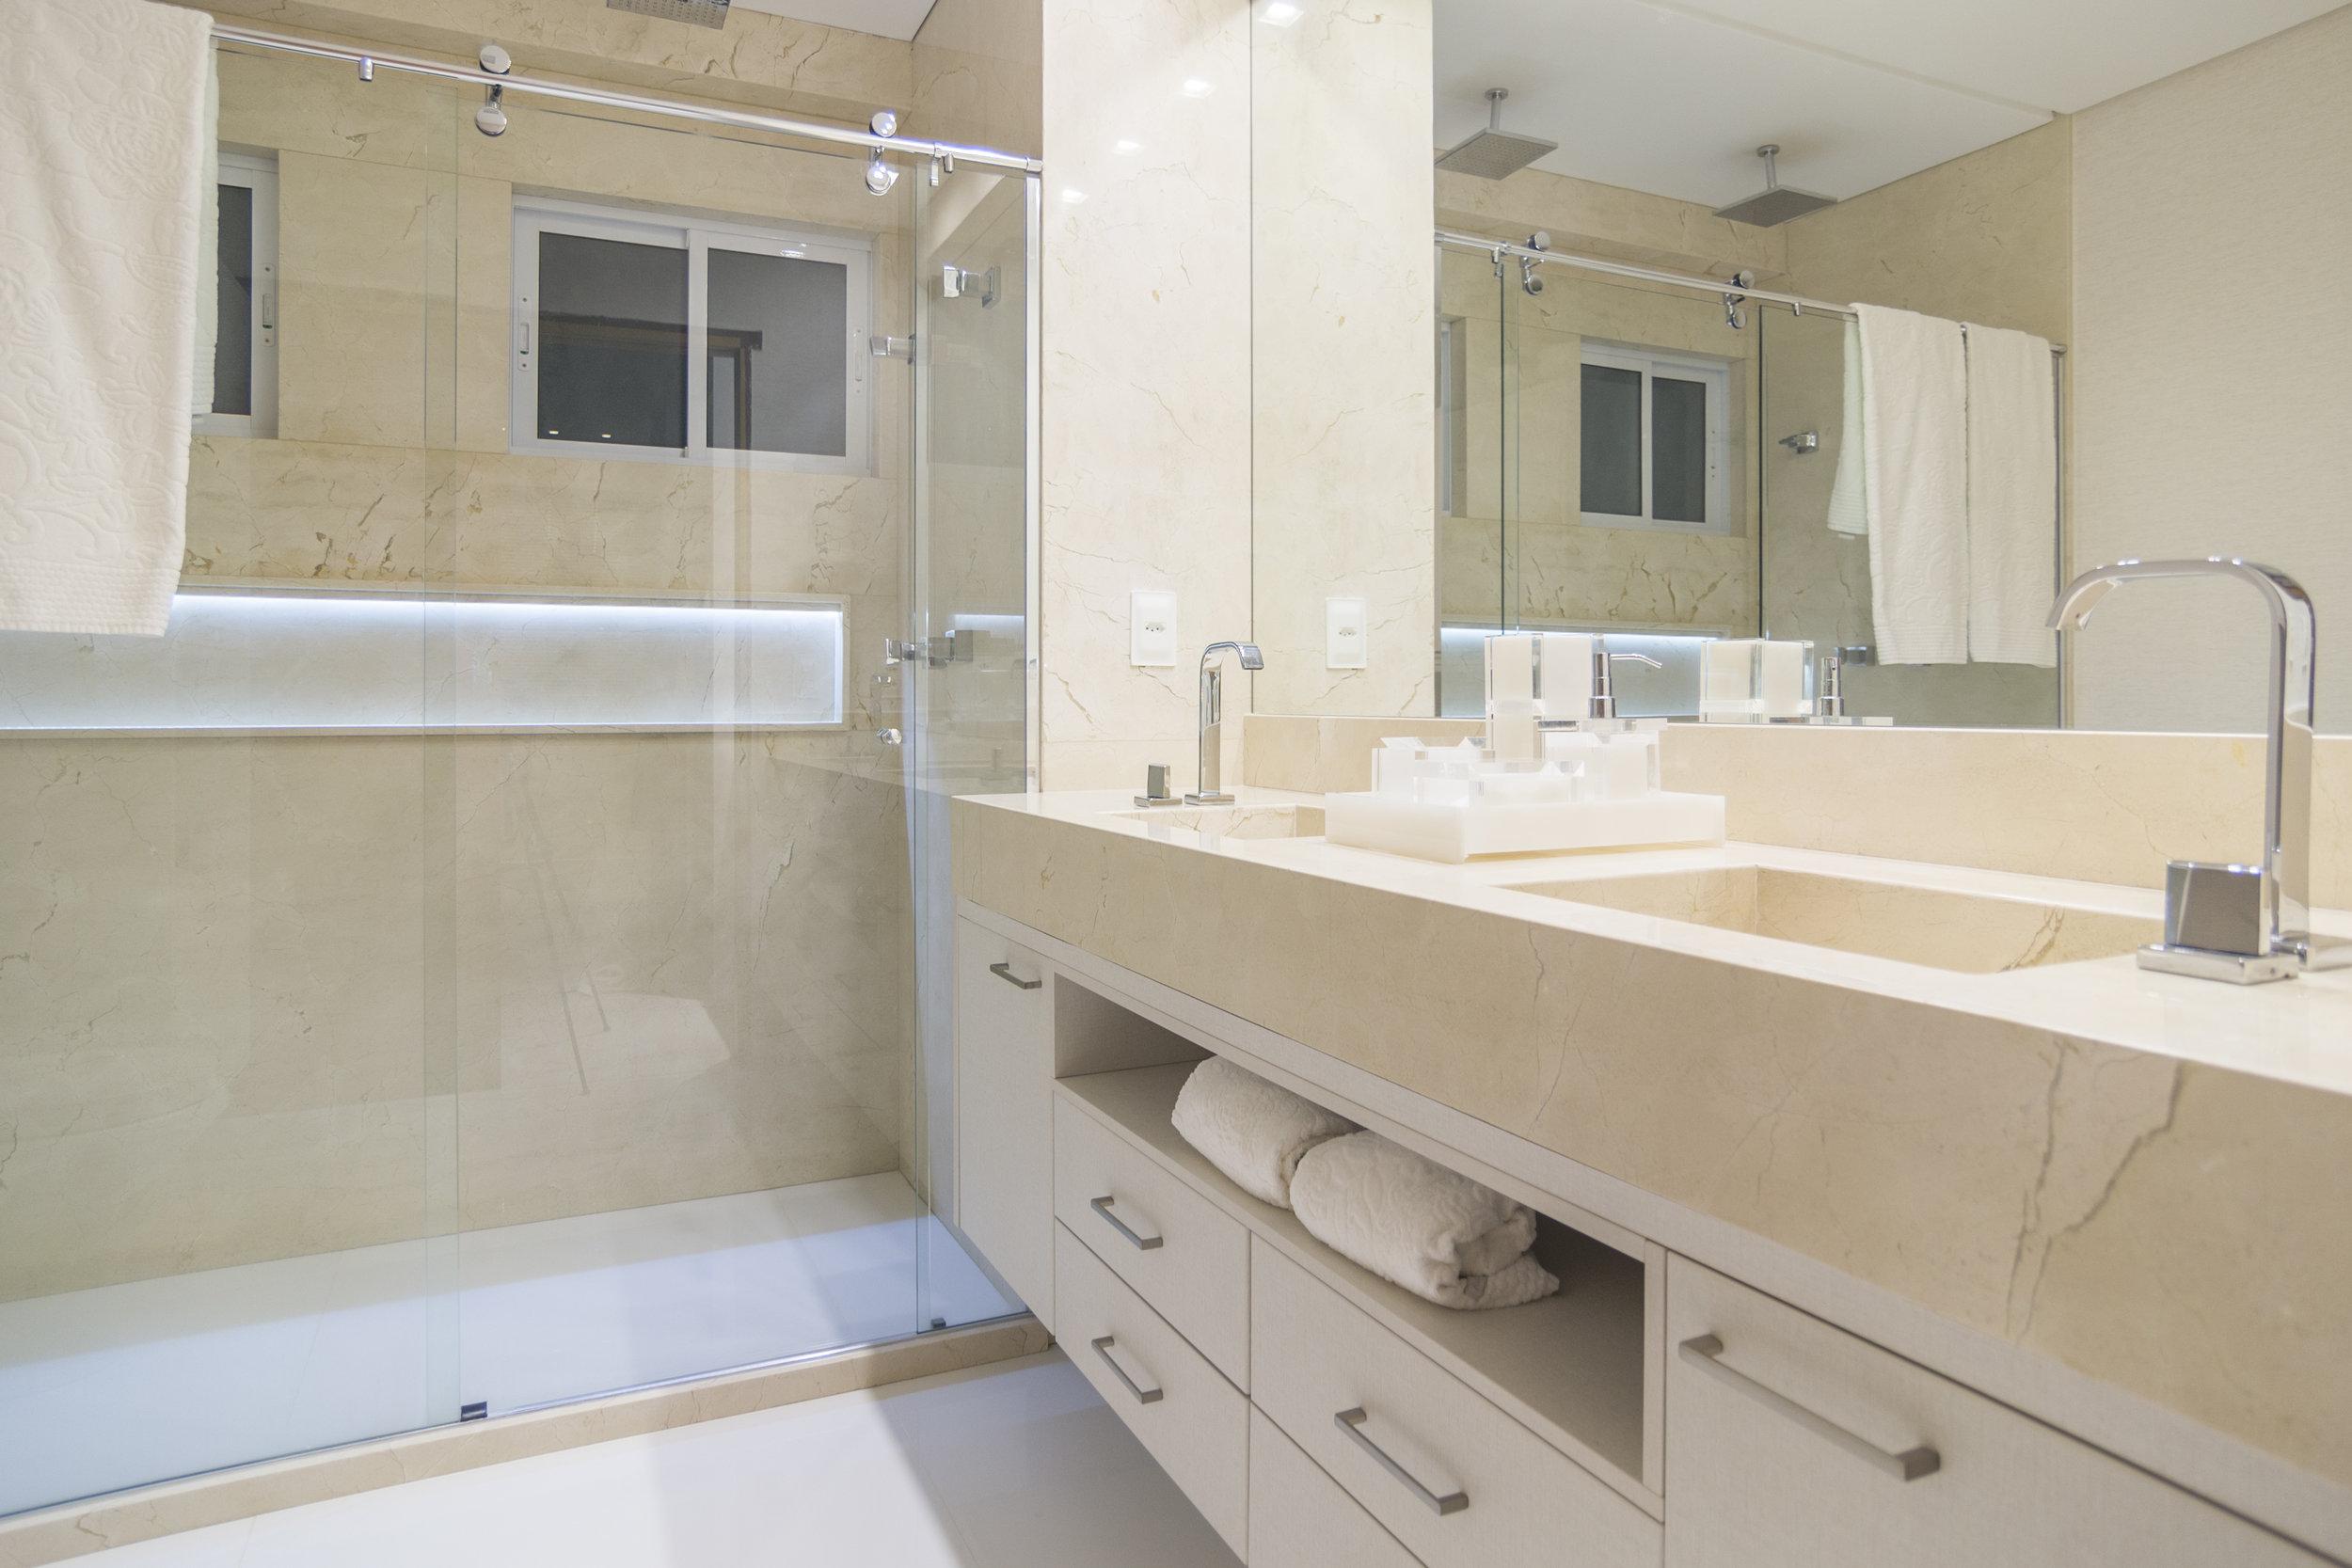 projeto-arquitetonico-robertoindira-duo-arquitetura-apartamentos-quarto-06.jpg